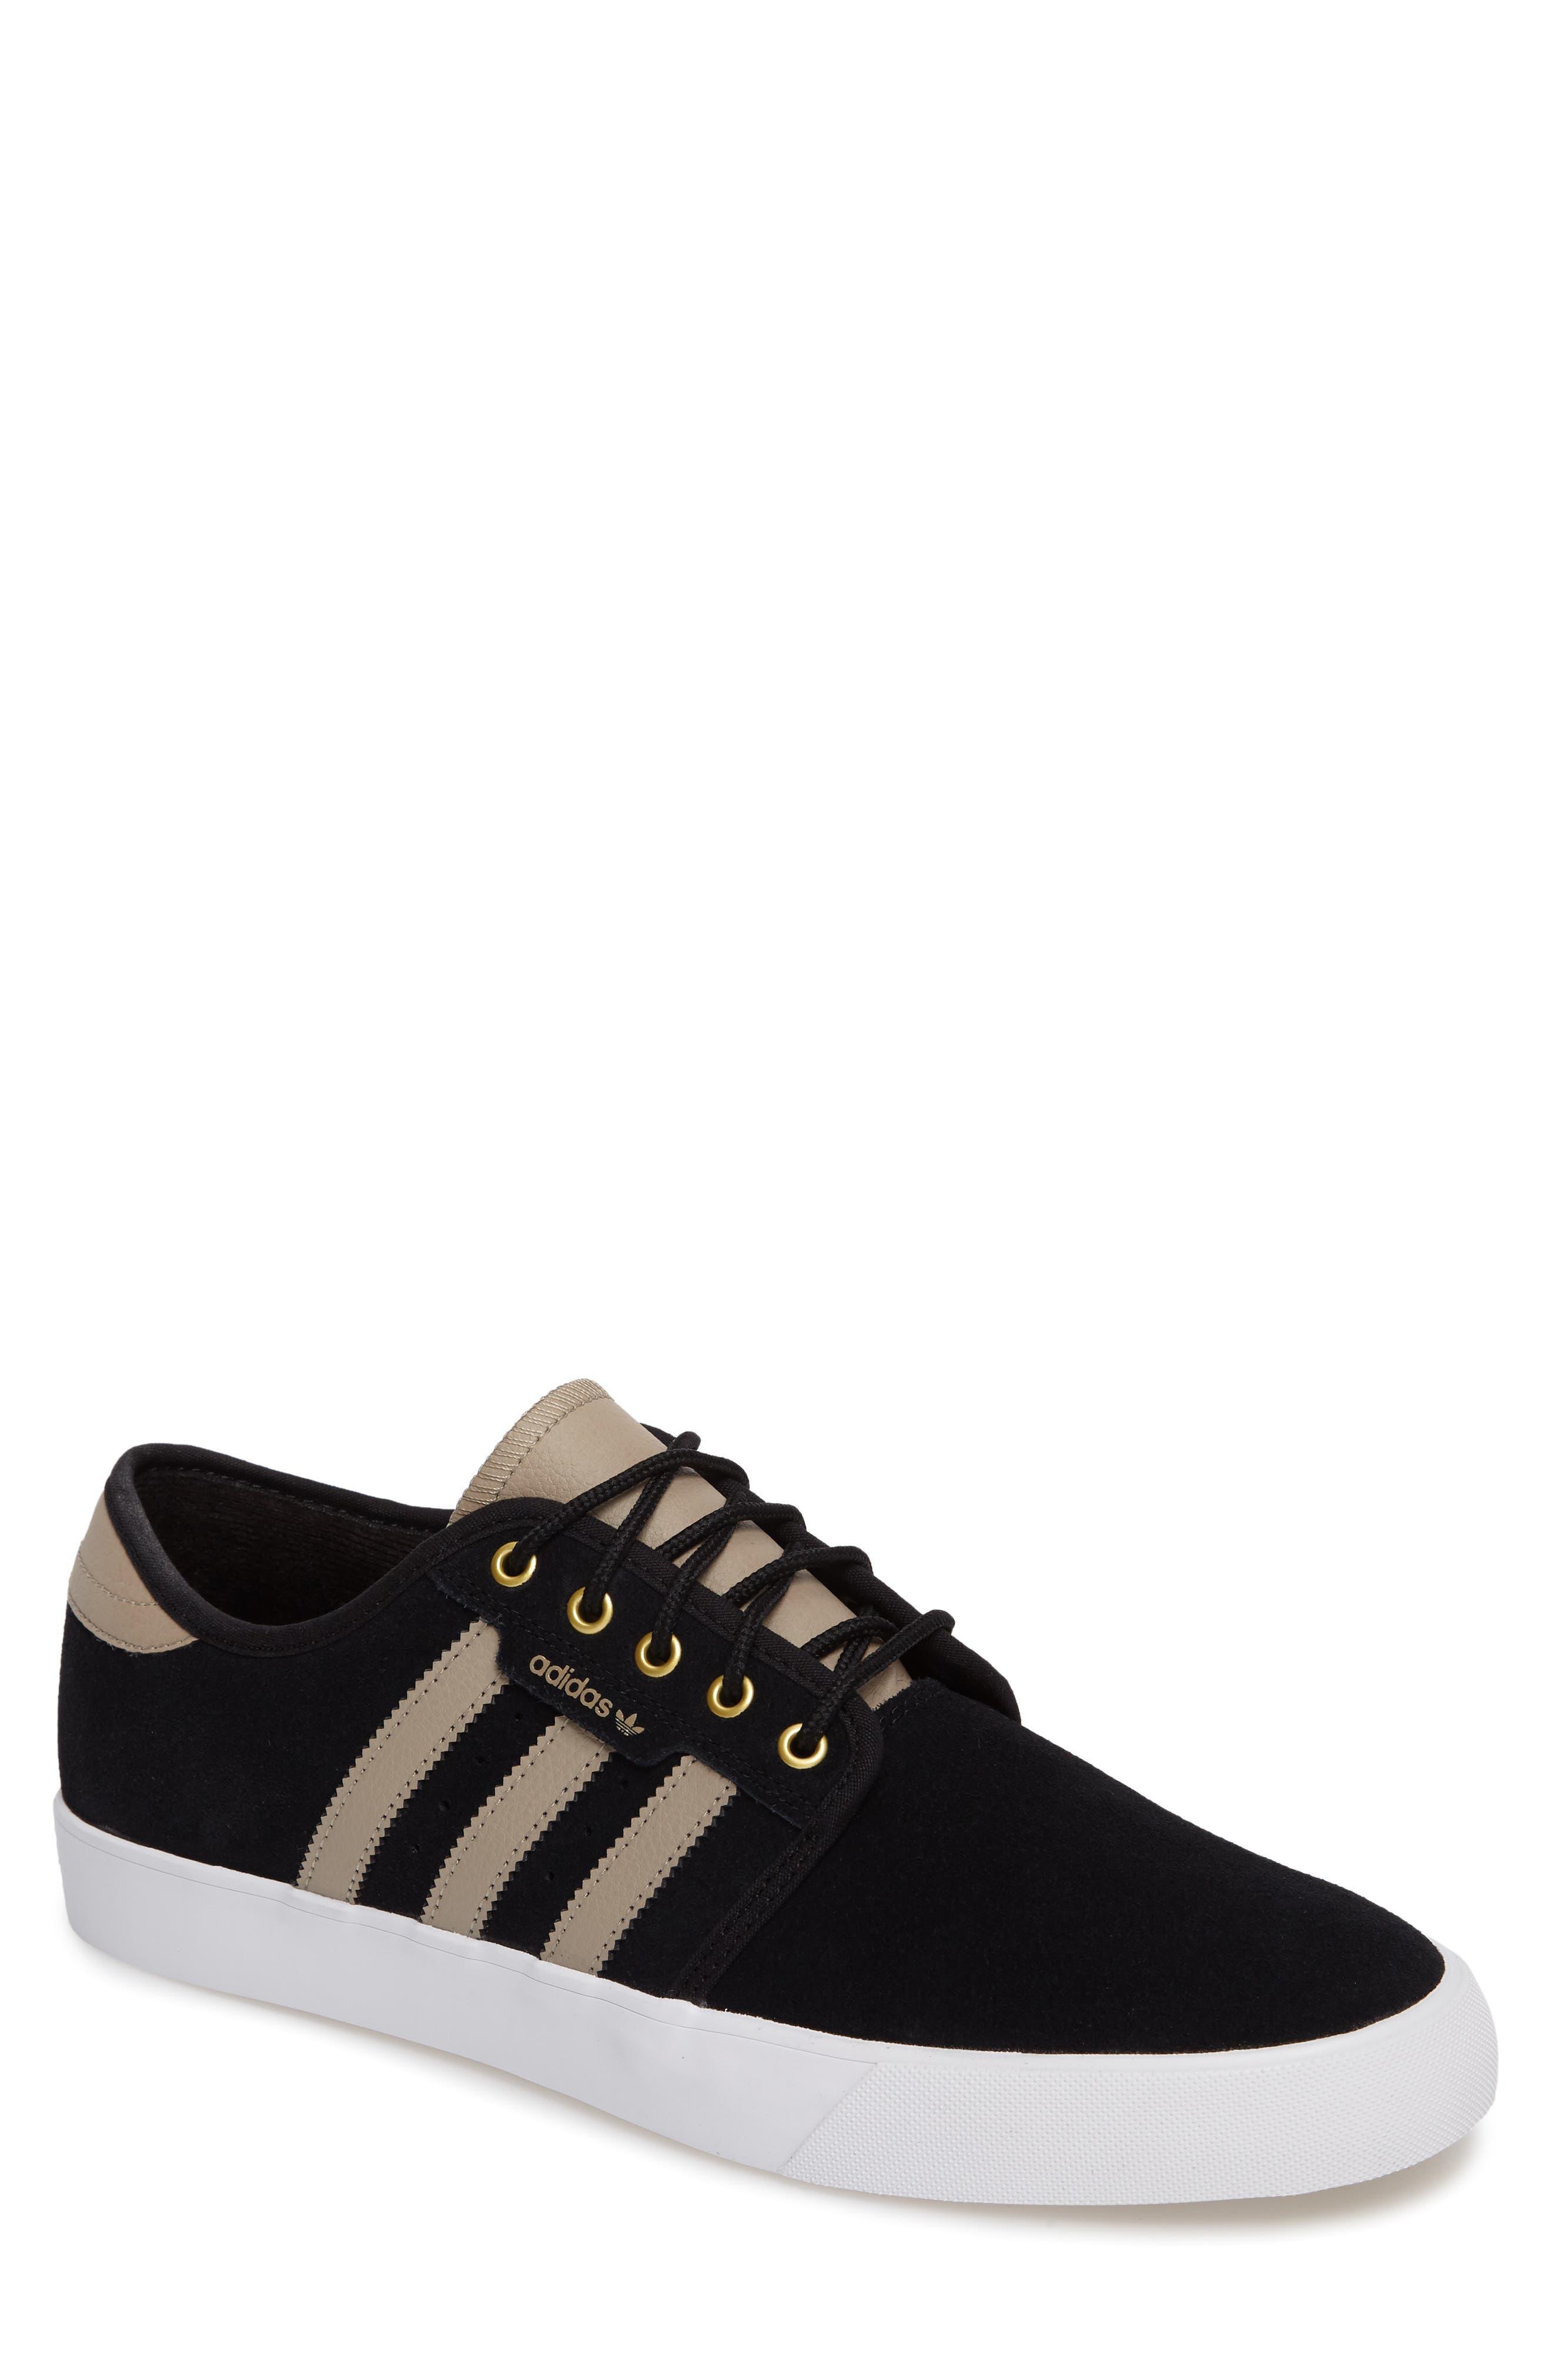 Main Image - adidas 'Seeley' Skate Sneaker (Men)